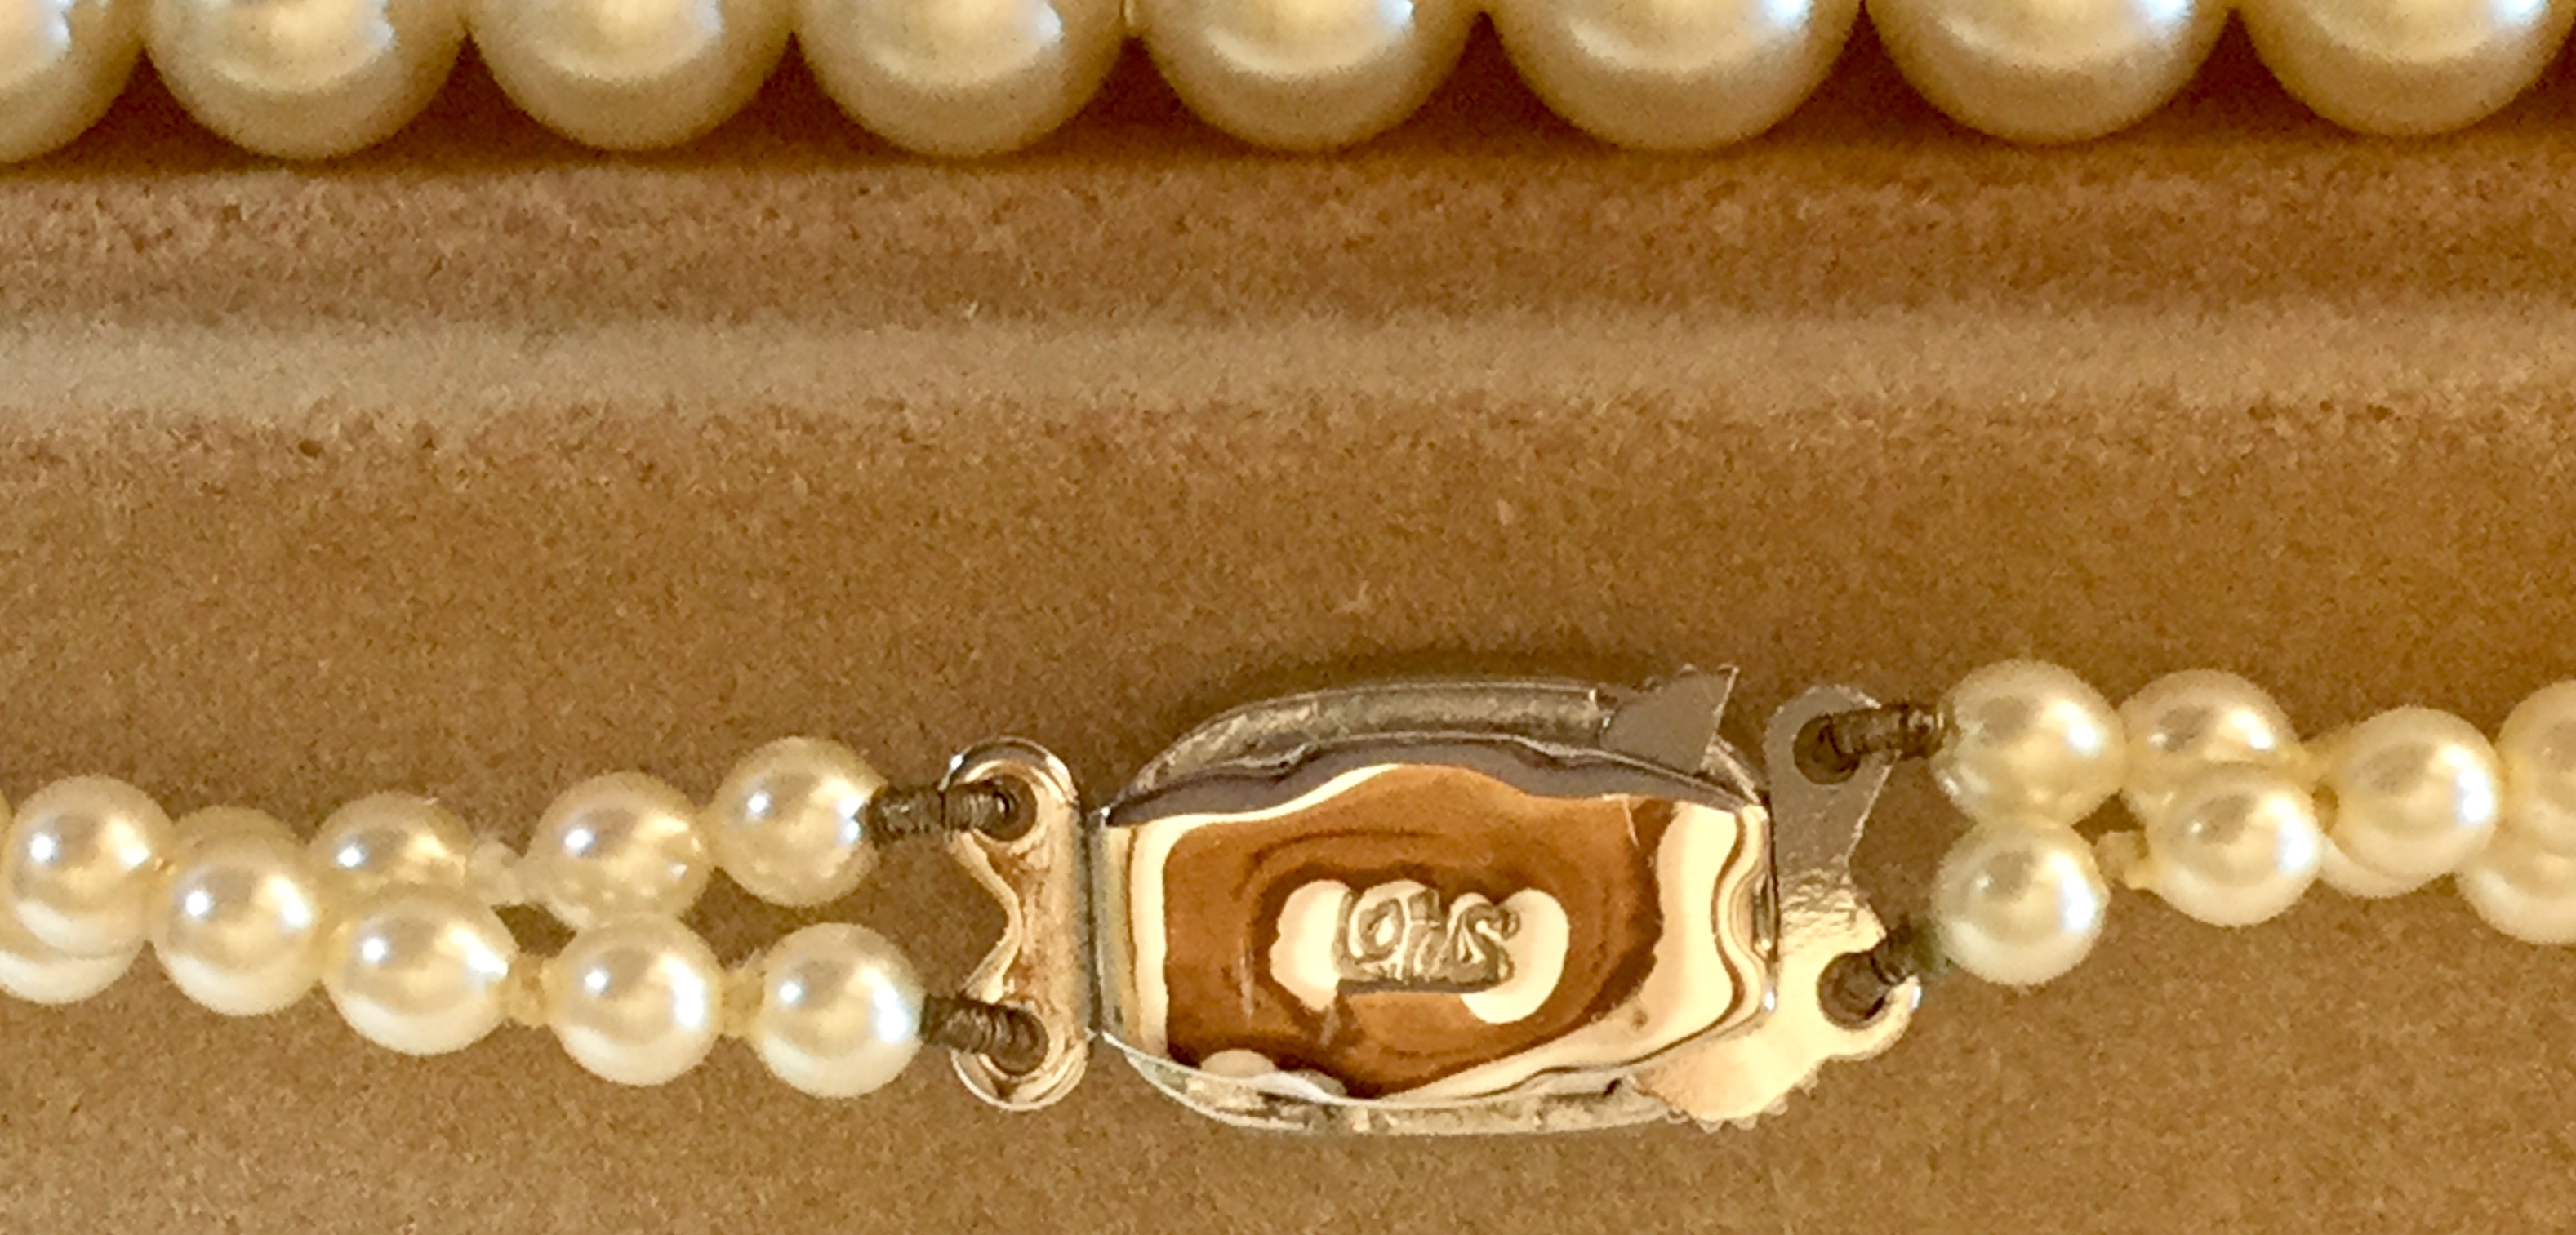 "Lot 5 - Vintage Lotus Double row 18"" Pearls Diamanté Clasp marked Lotus for bride wedding"